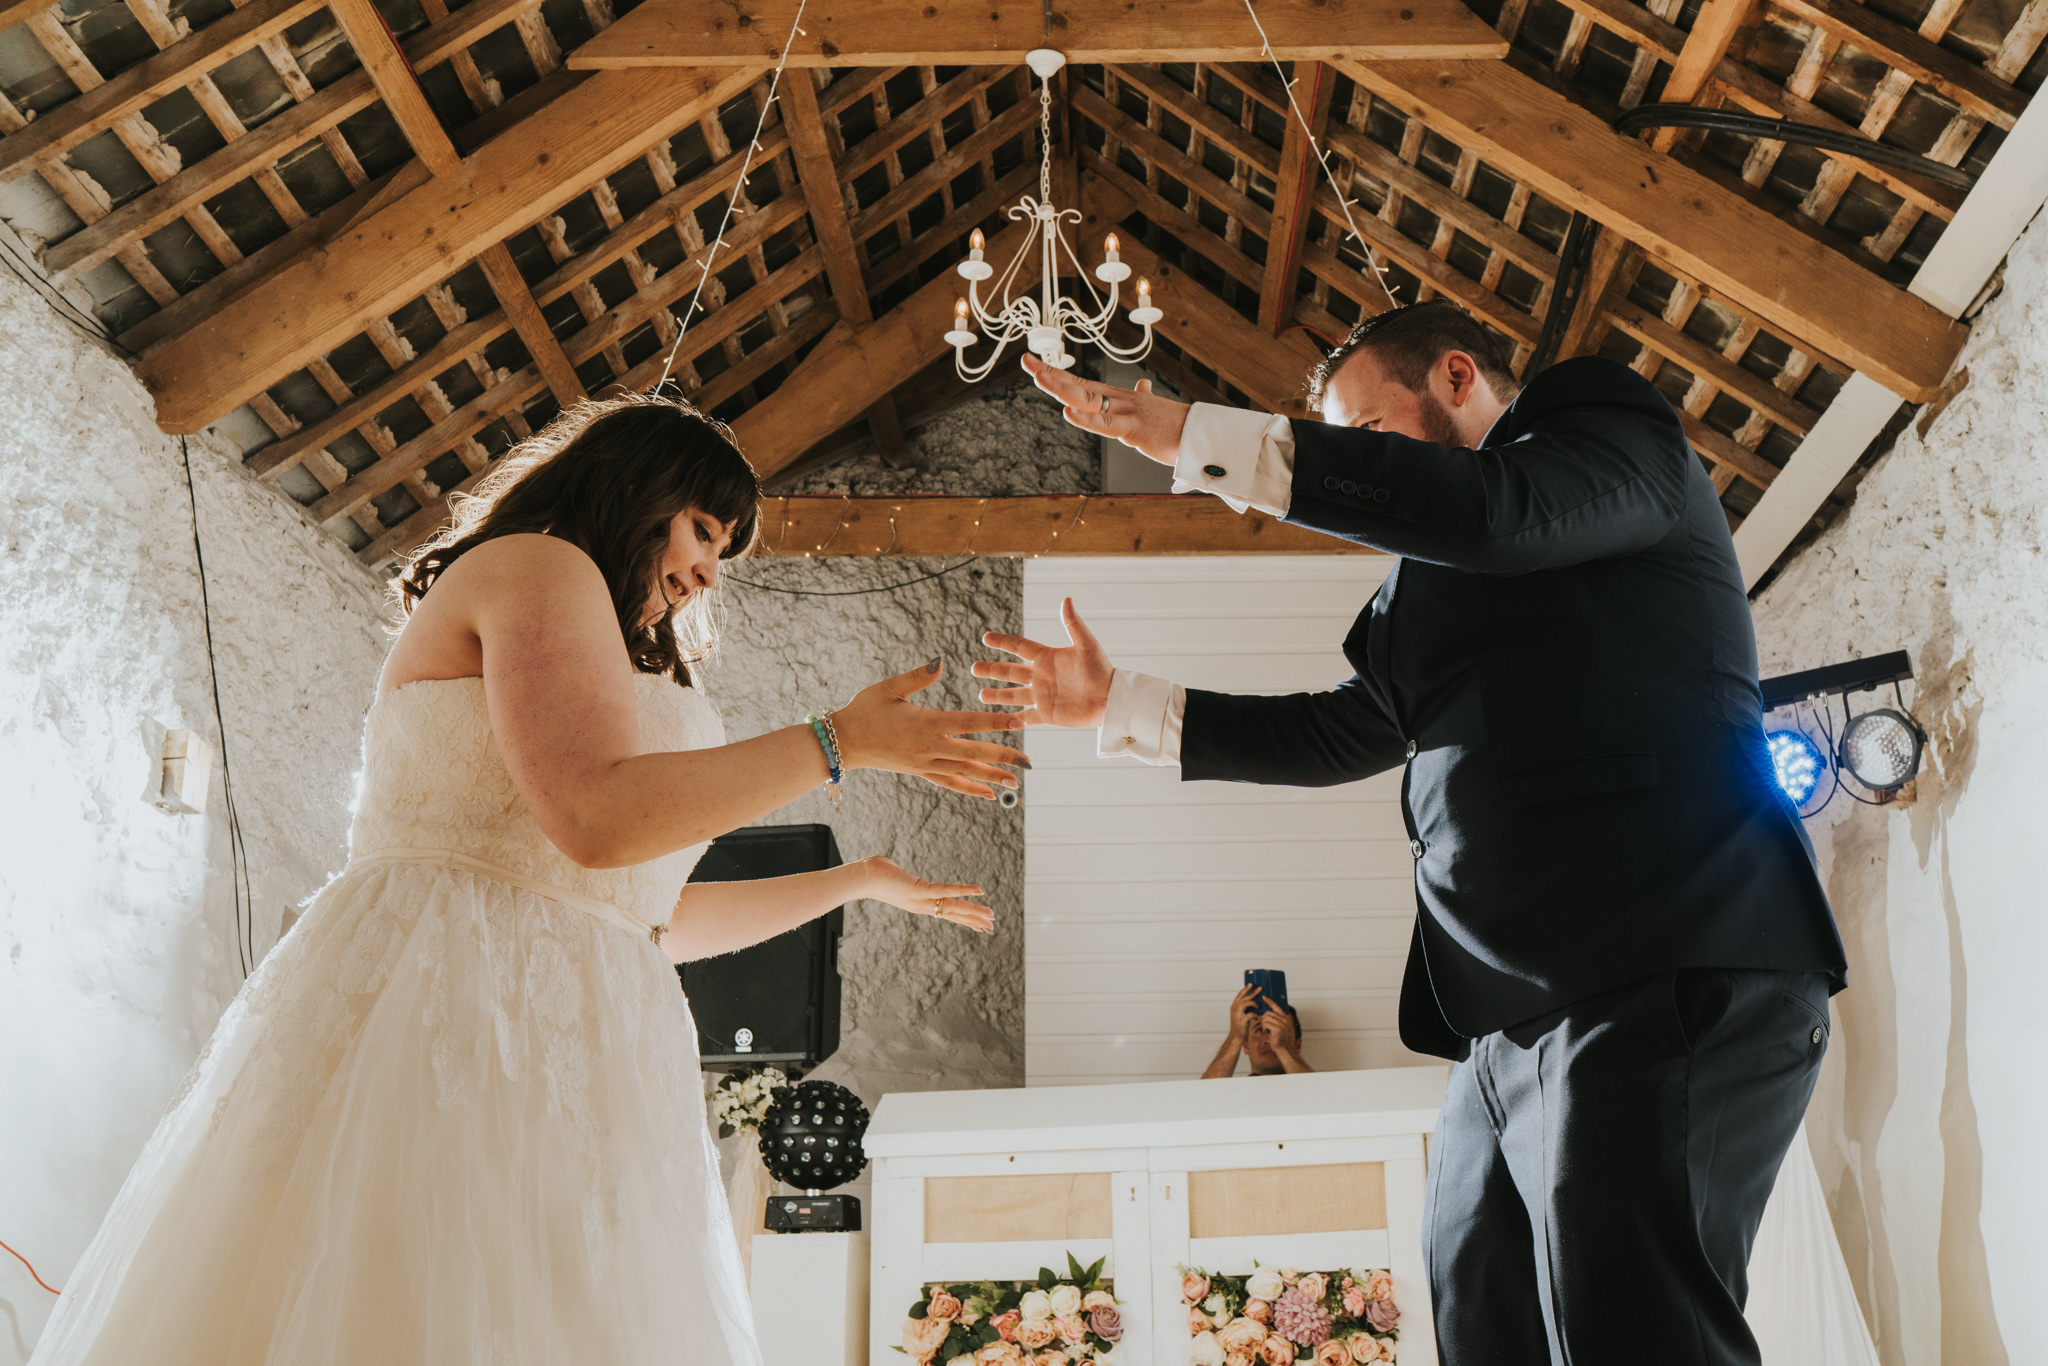 grace-sam-old-barn-clovelly-devon-wedding-photographer-grace-elizabeth-essex-suffolk-norfolk-wedding-photographer (120 of 132).jpg